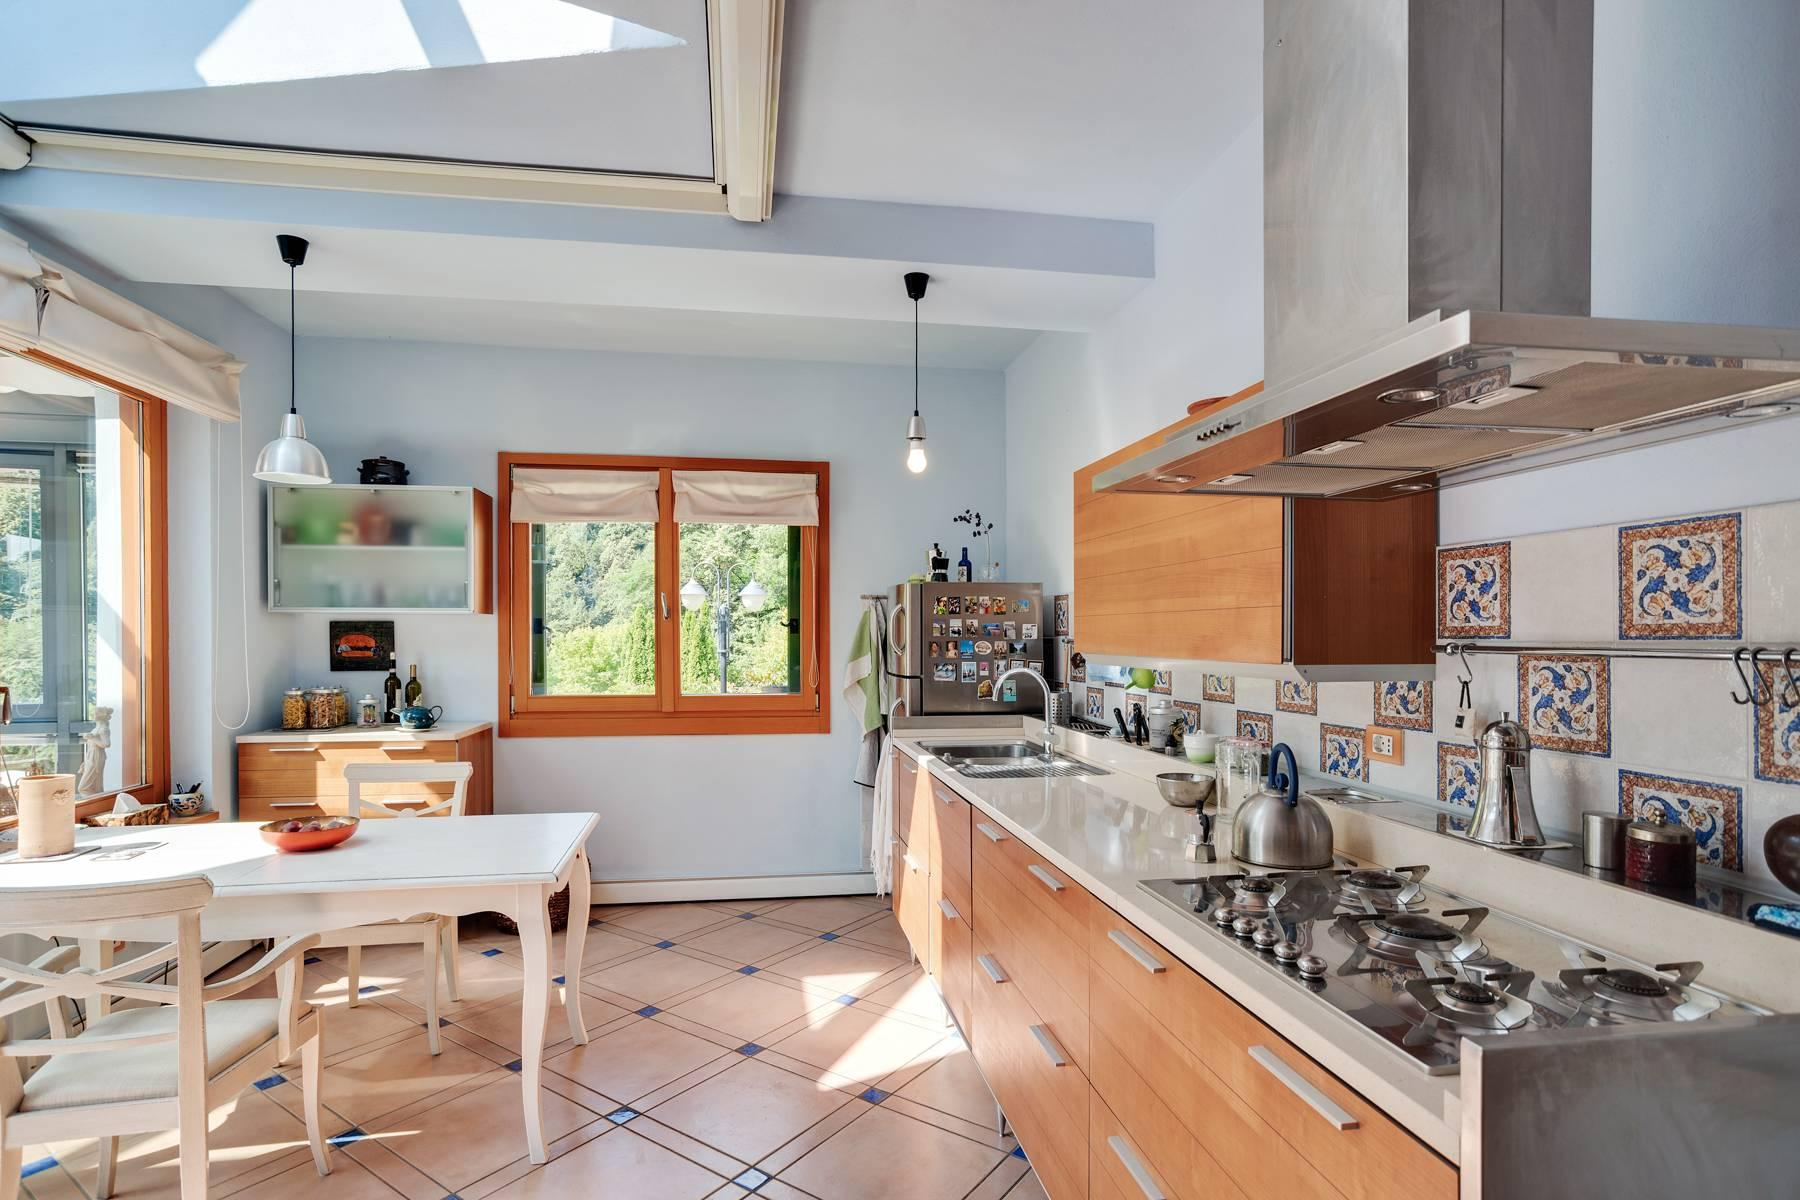 Splendida villa moderna sulla collina soleggiata sopra Argegno - 21